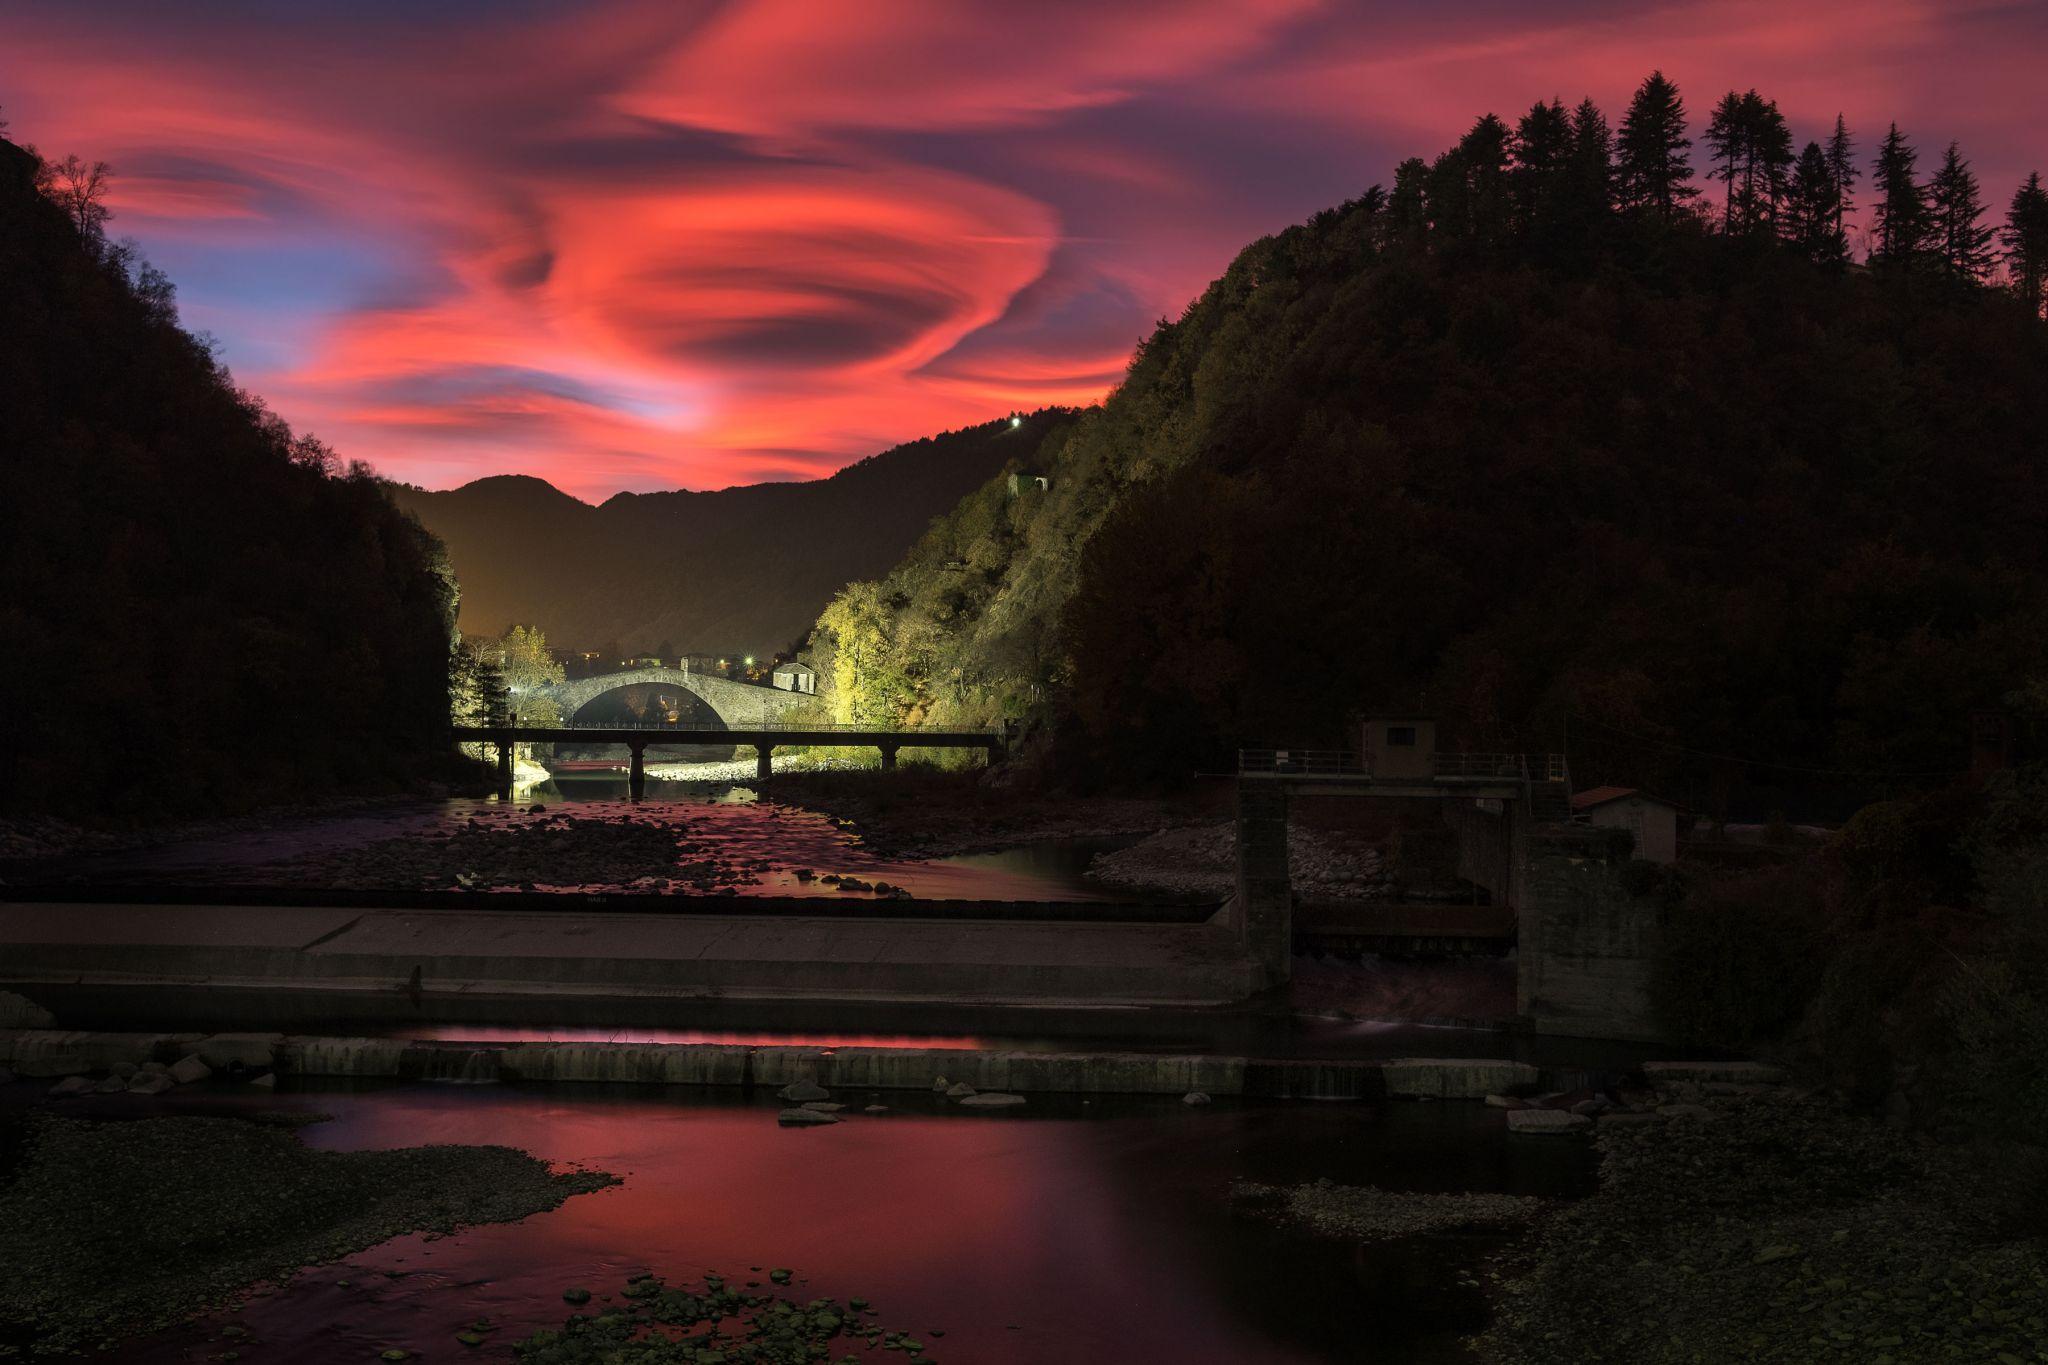 Ponte del Diavolo (Devil's Bridge), Italy